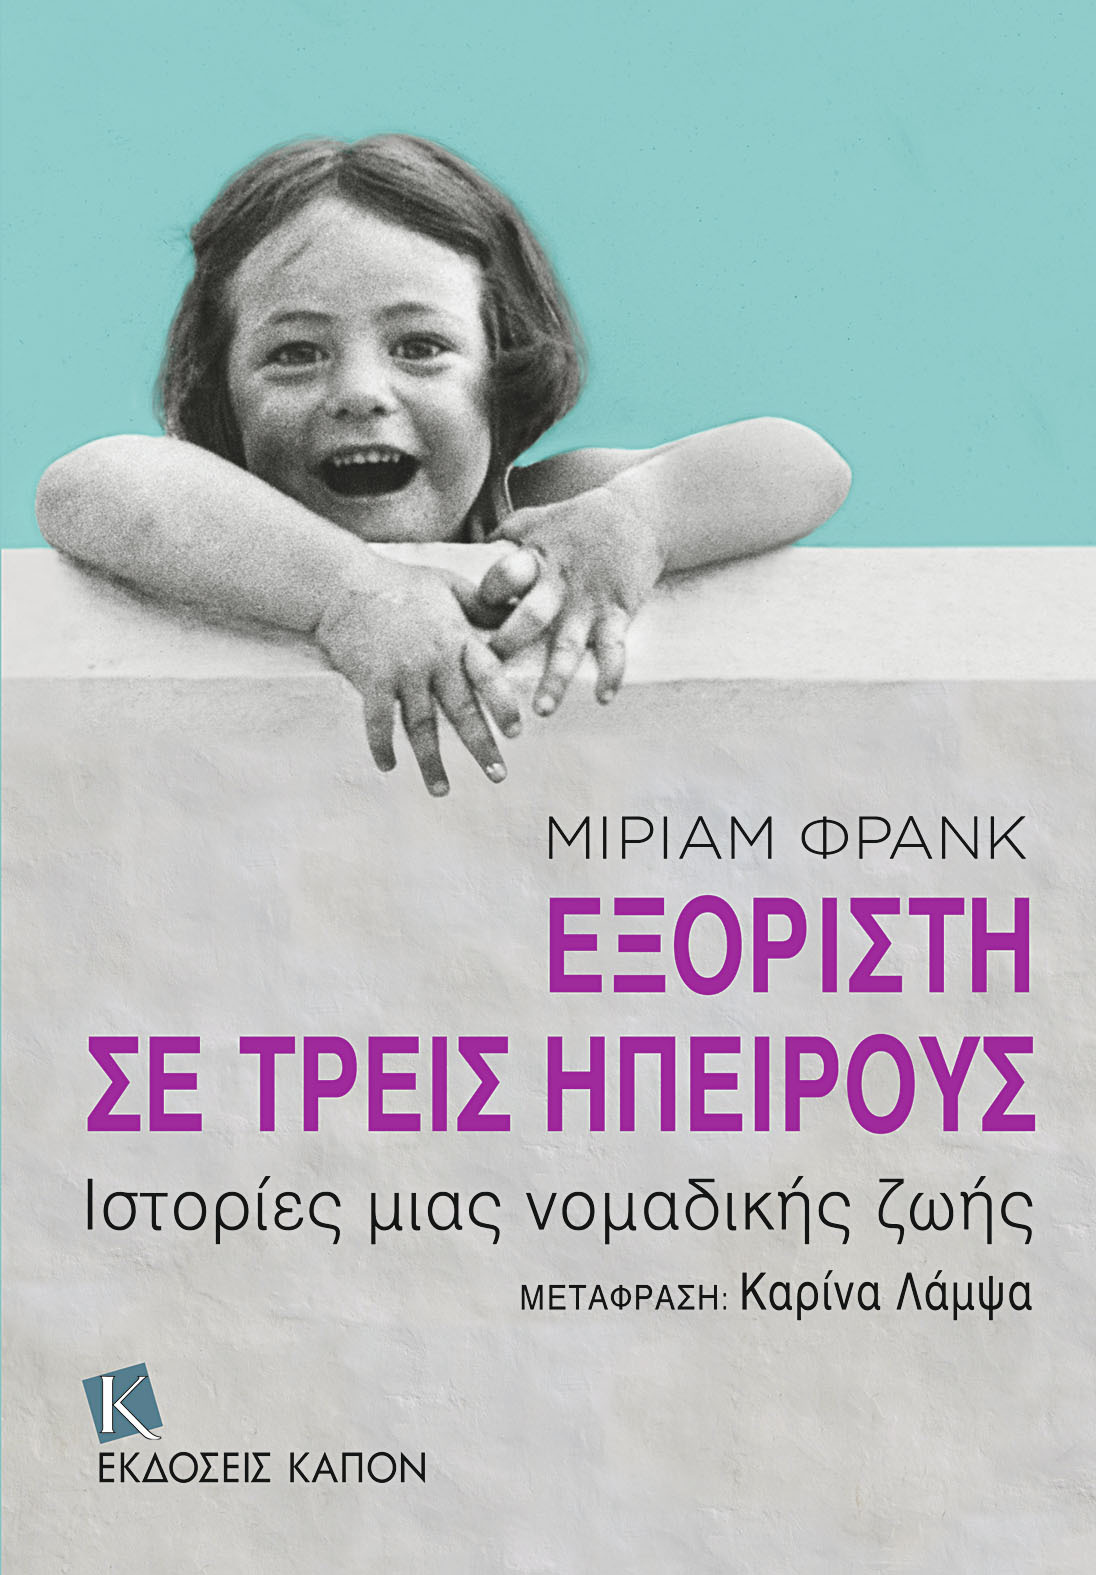 MIRIAM FRANK